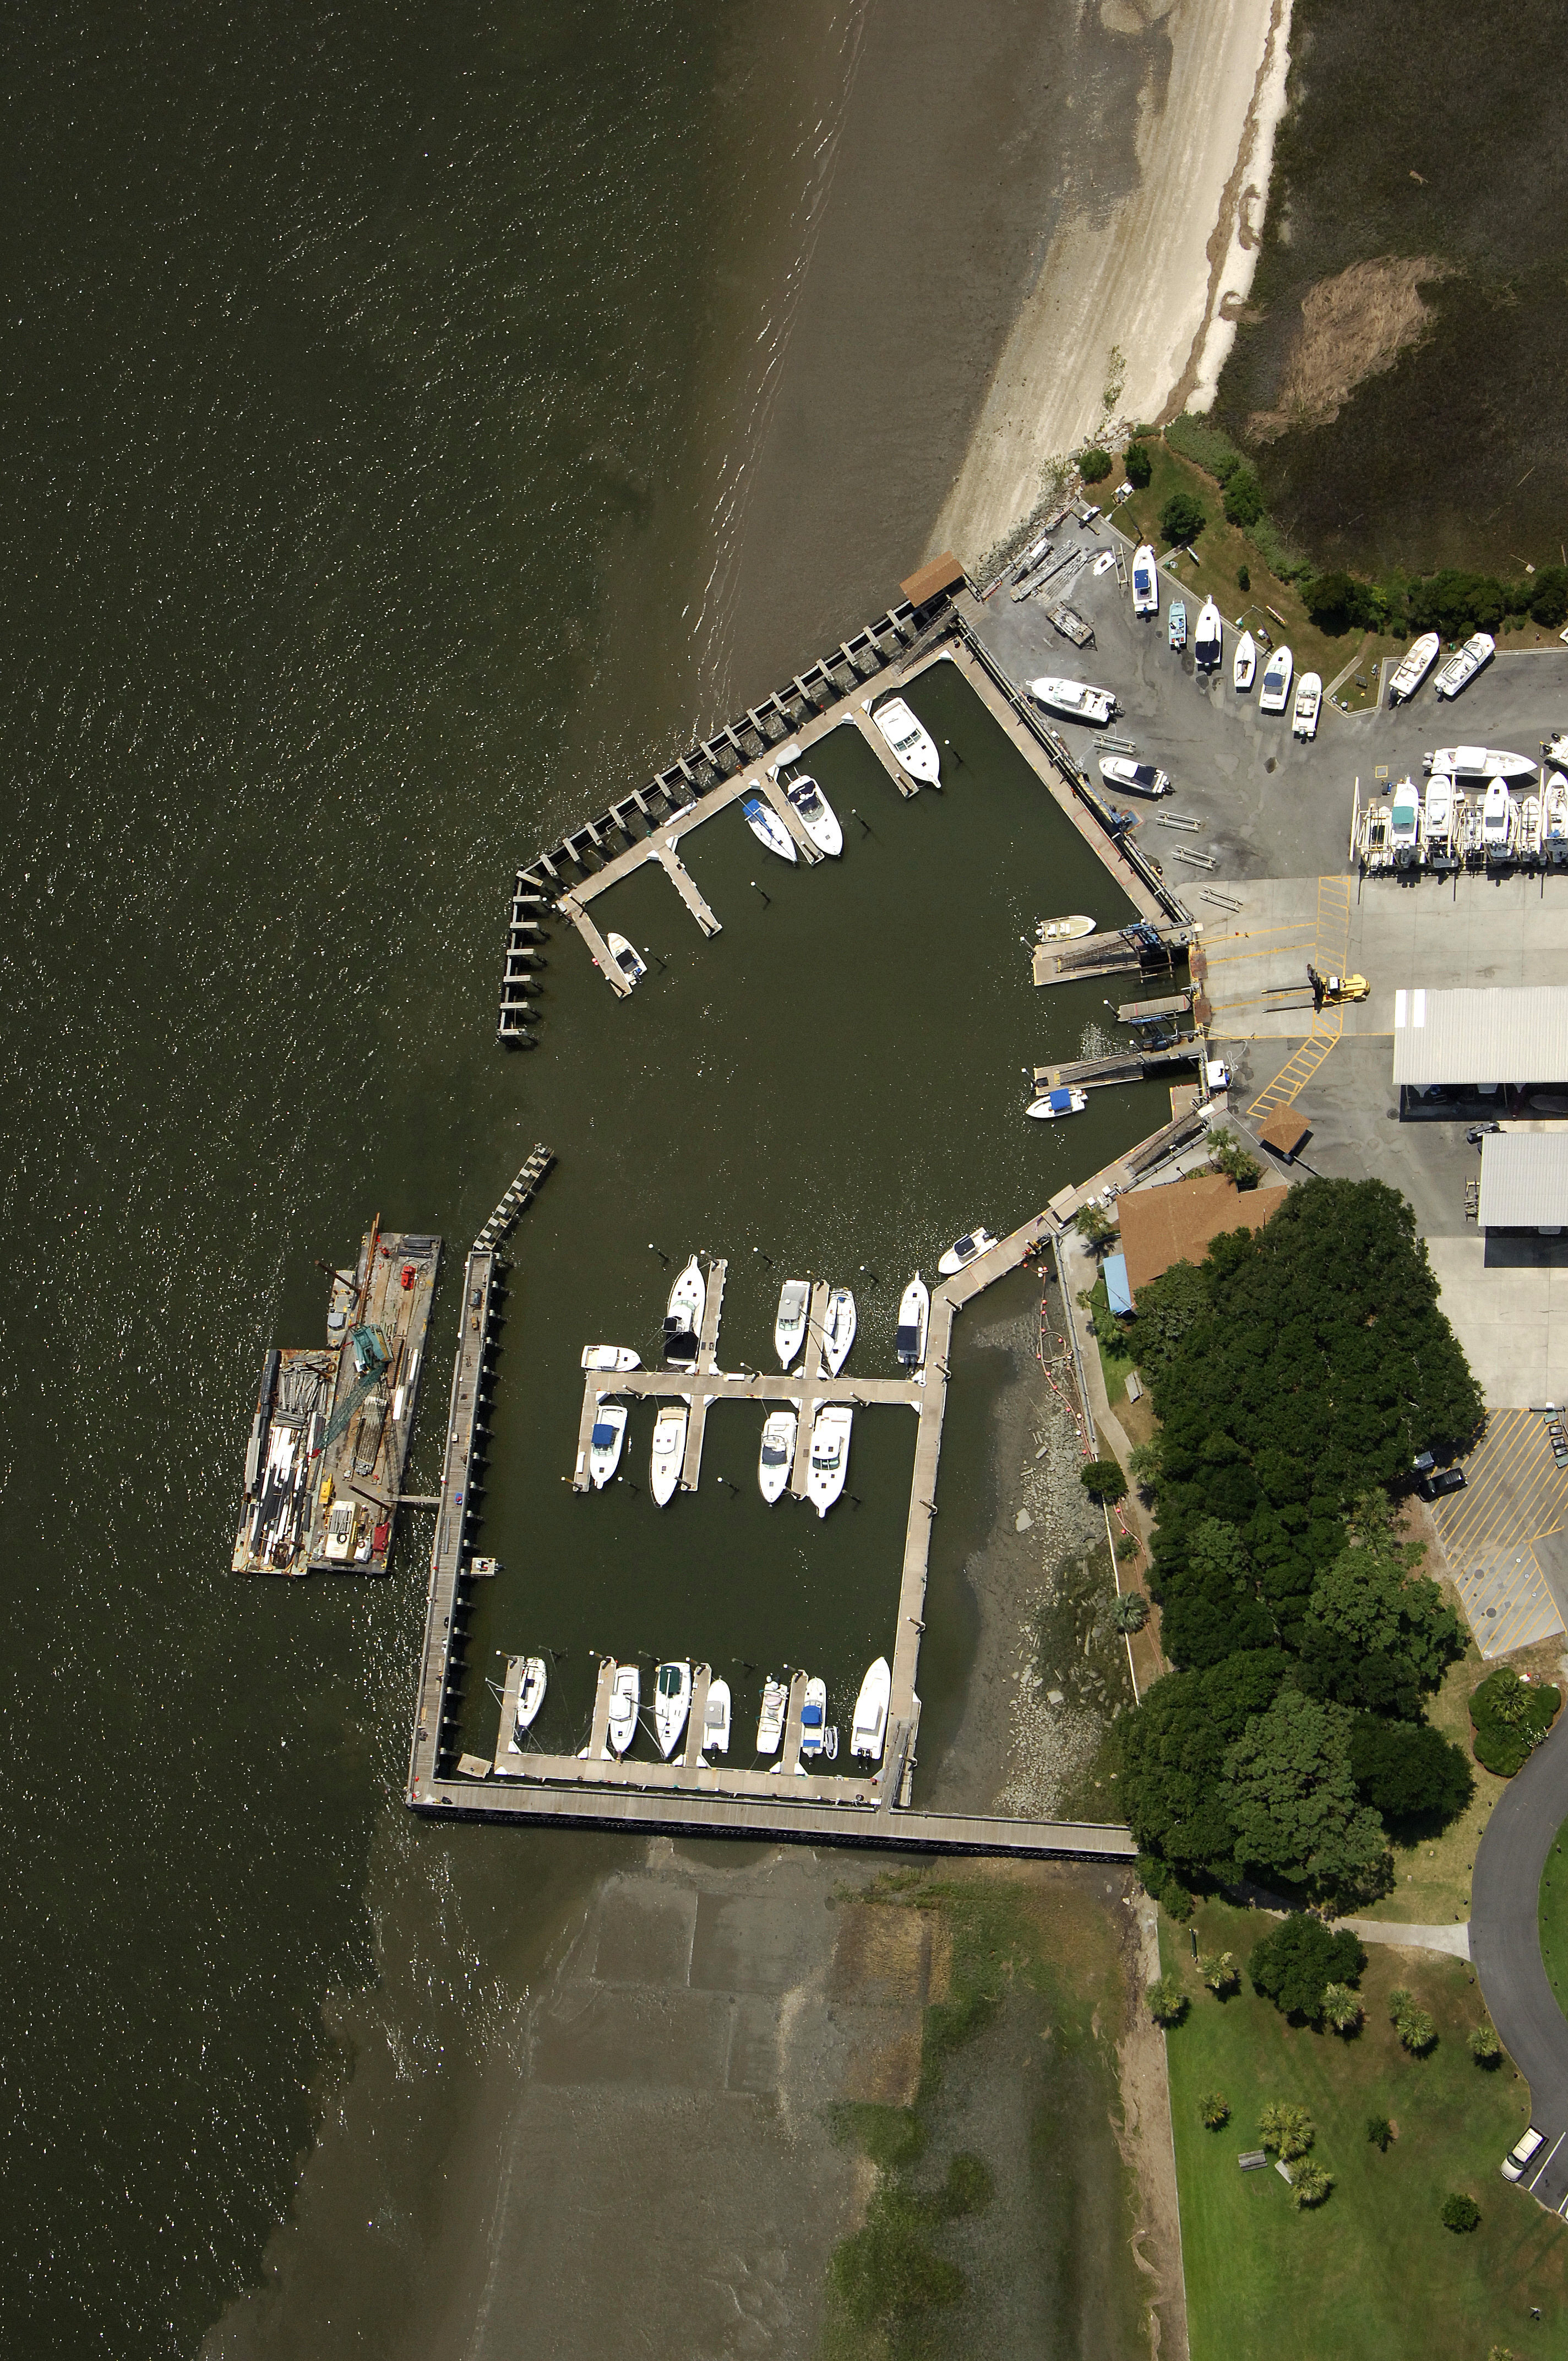 Landings harbor marina in savannah ga united states marina landings harbor marina nvjuhfo Images